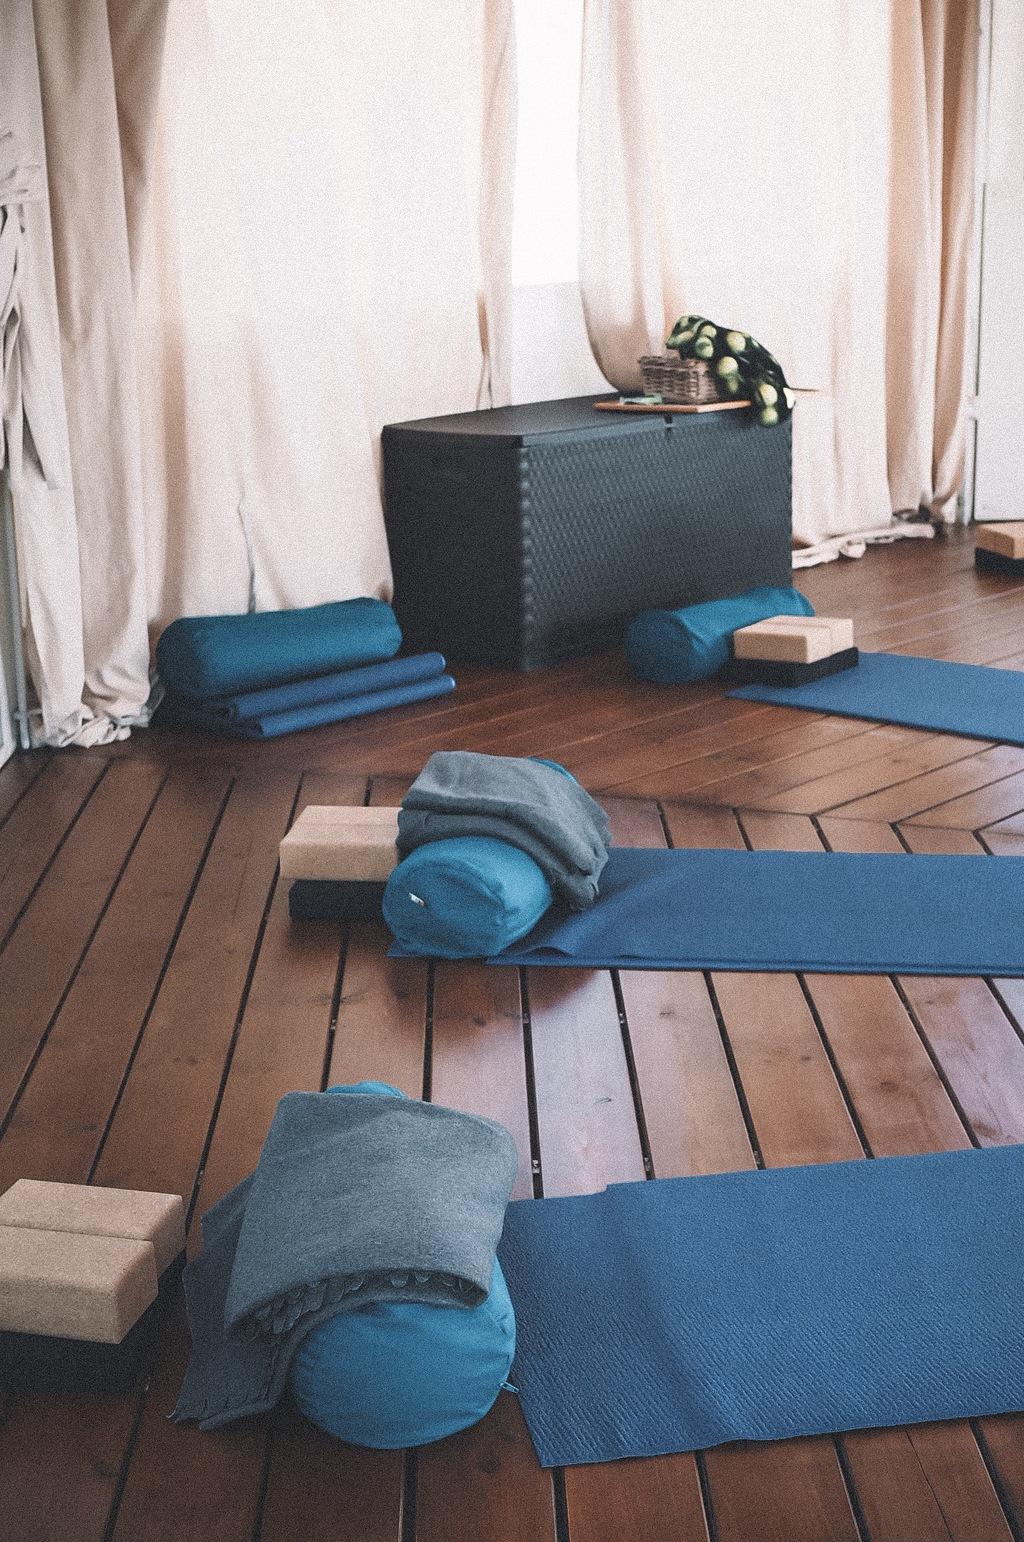 Self Revelations & Learning Self Love at Kali Yoga Retreat